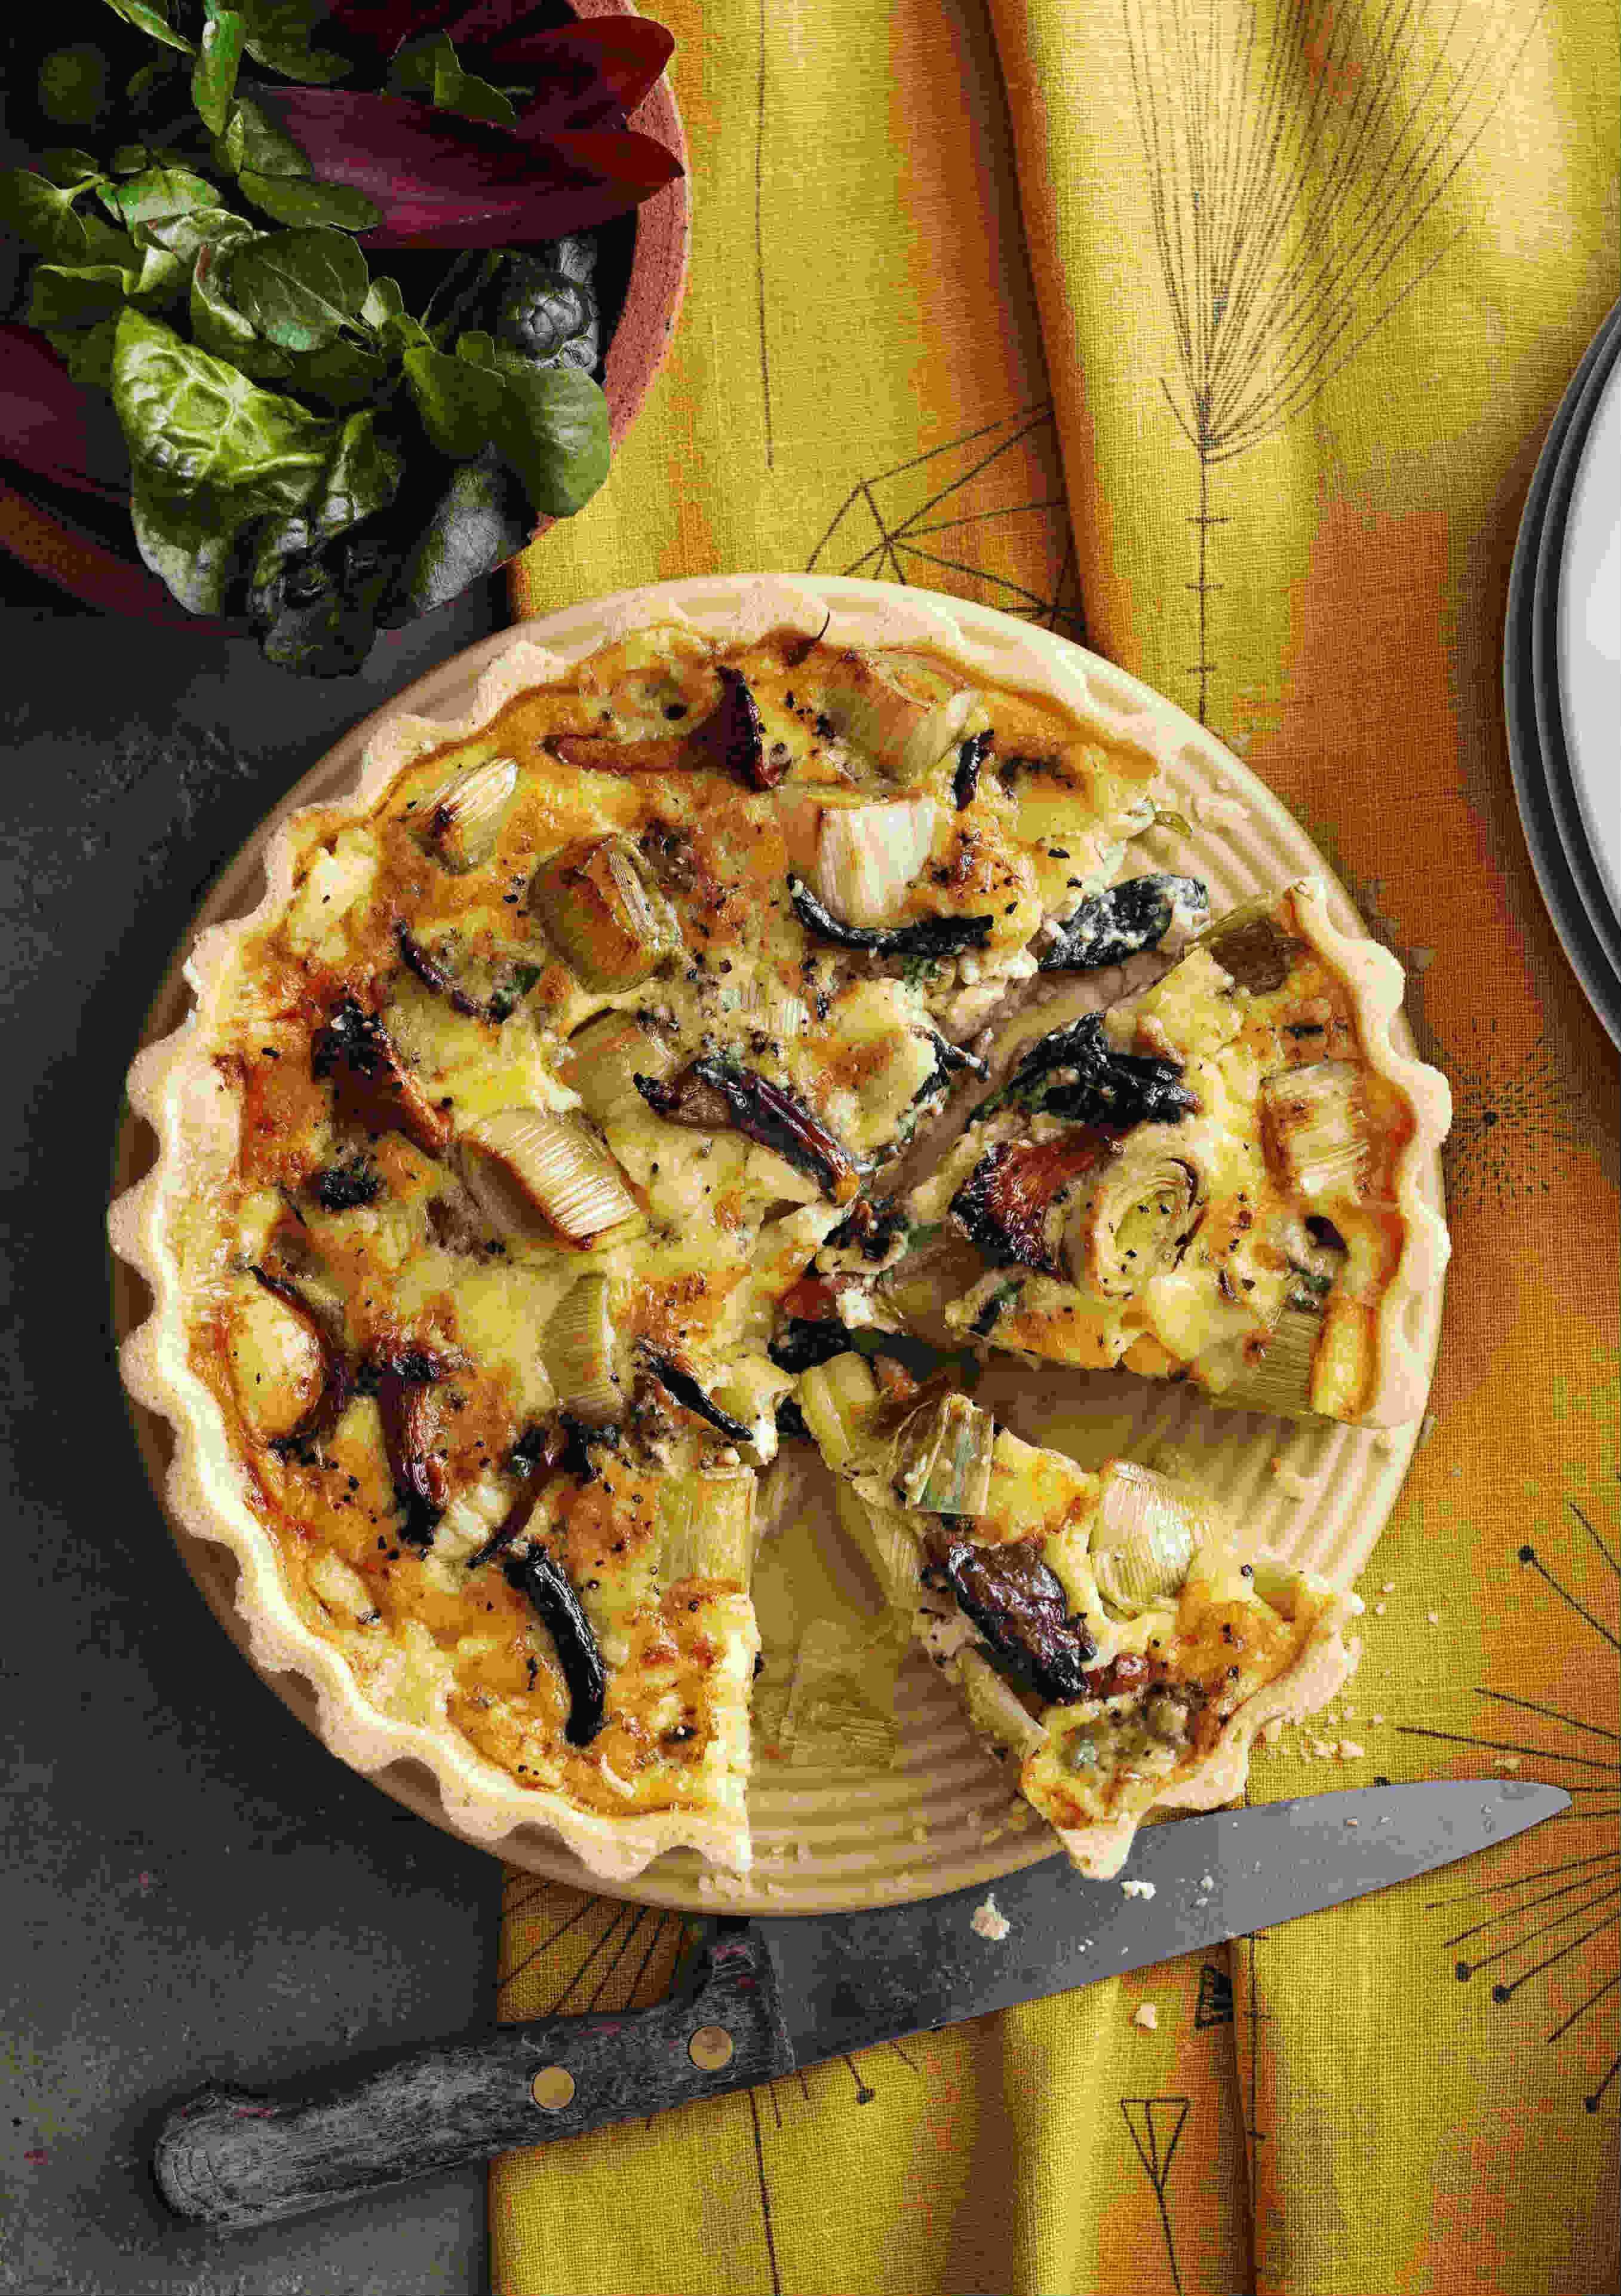 Wild Mushroom Tart Recipe With Leek and Stichelton